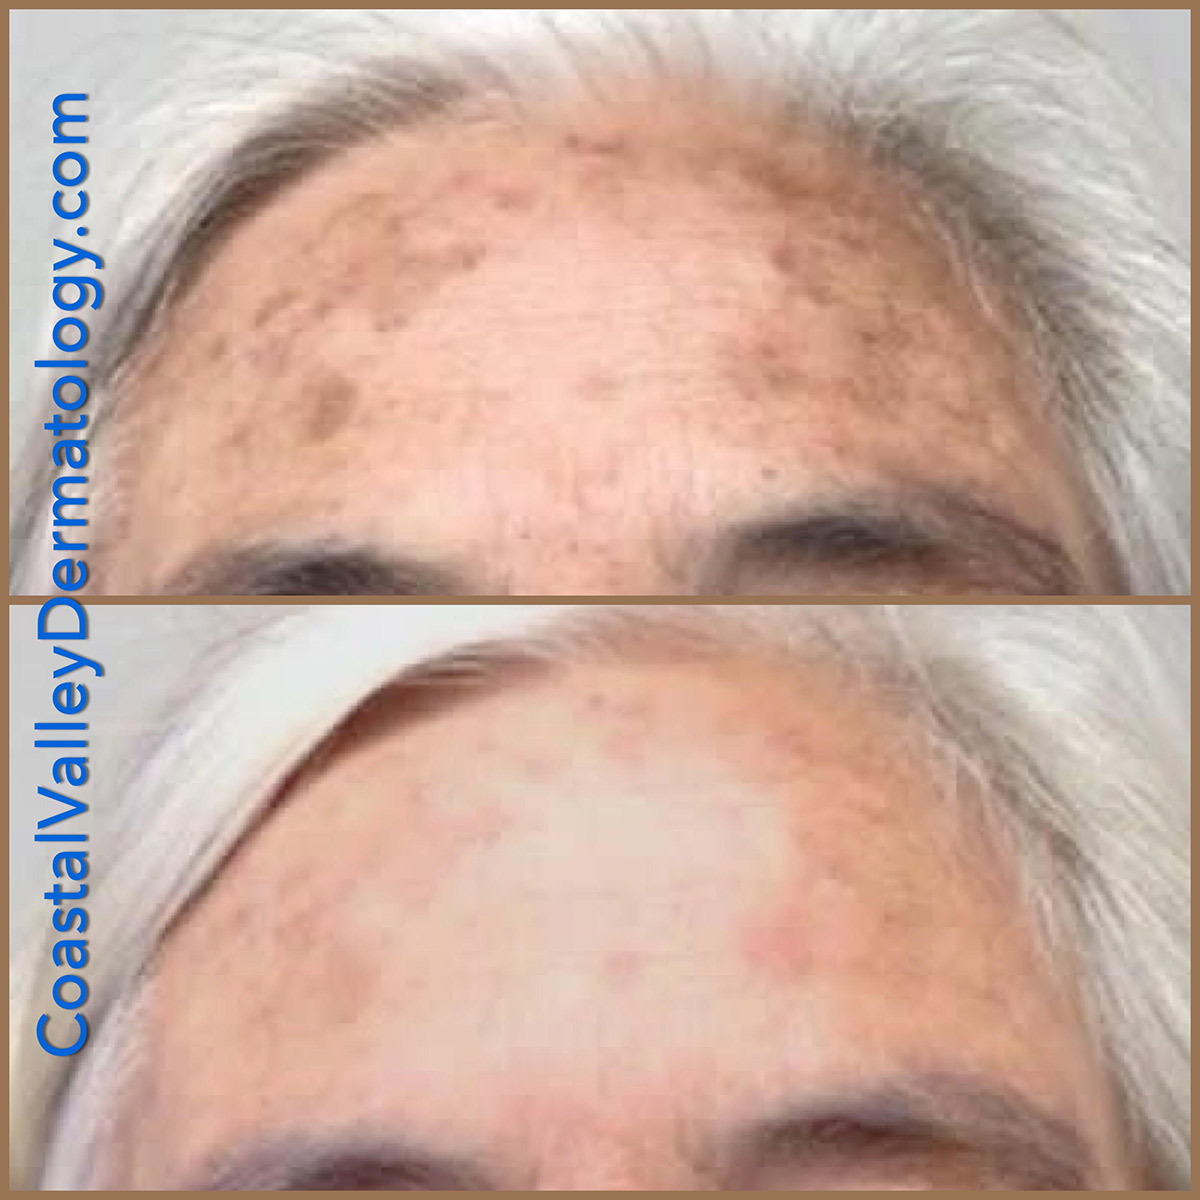 coastal-valley-dermatology-carmel-bbl-before-after-photo